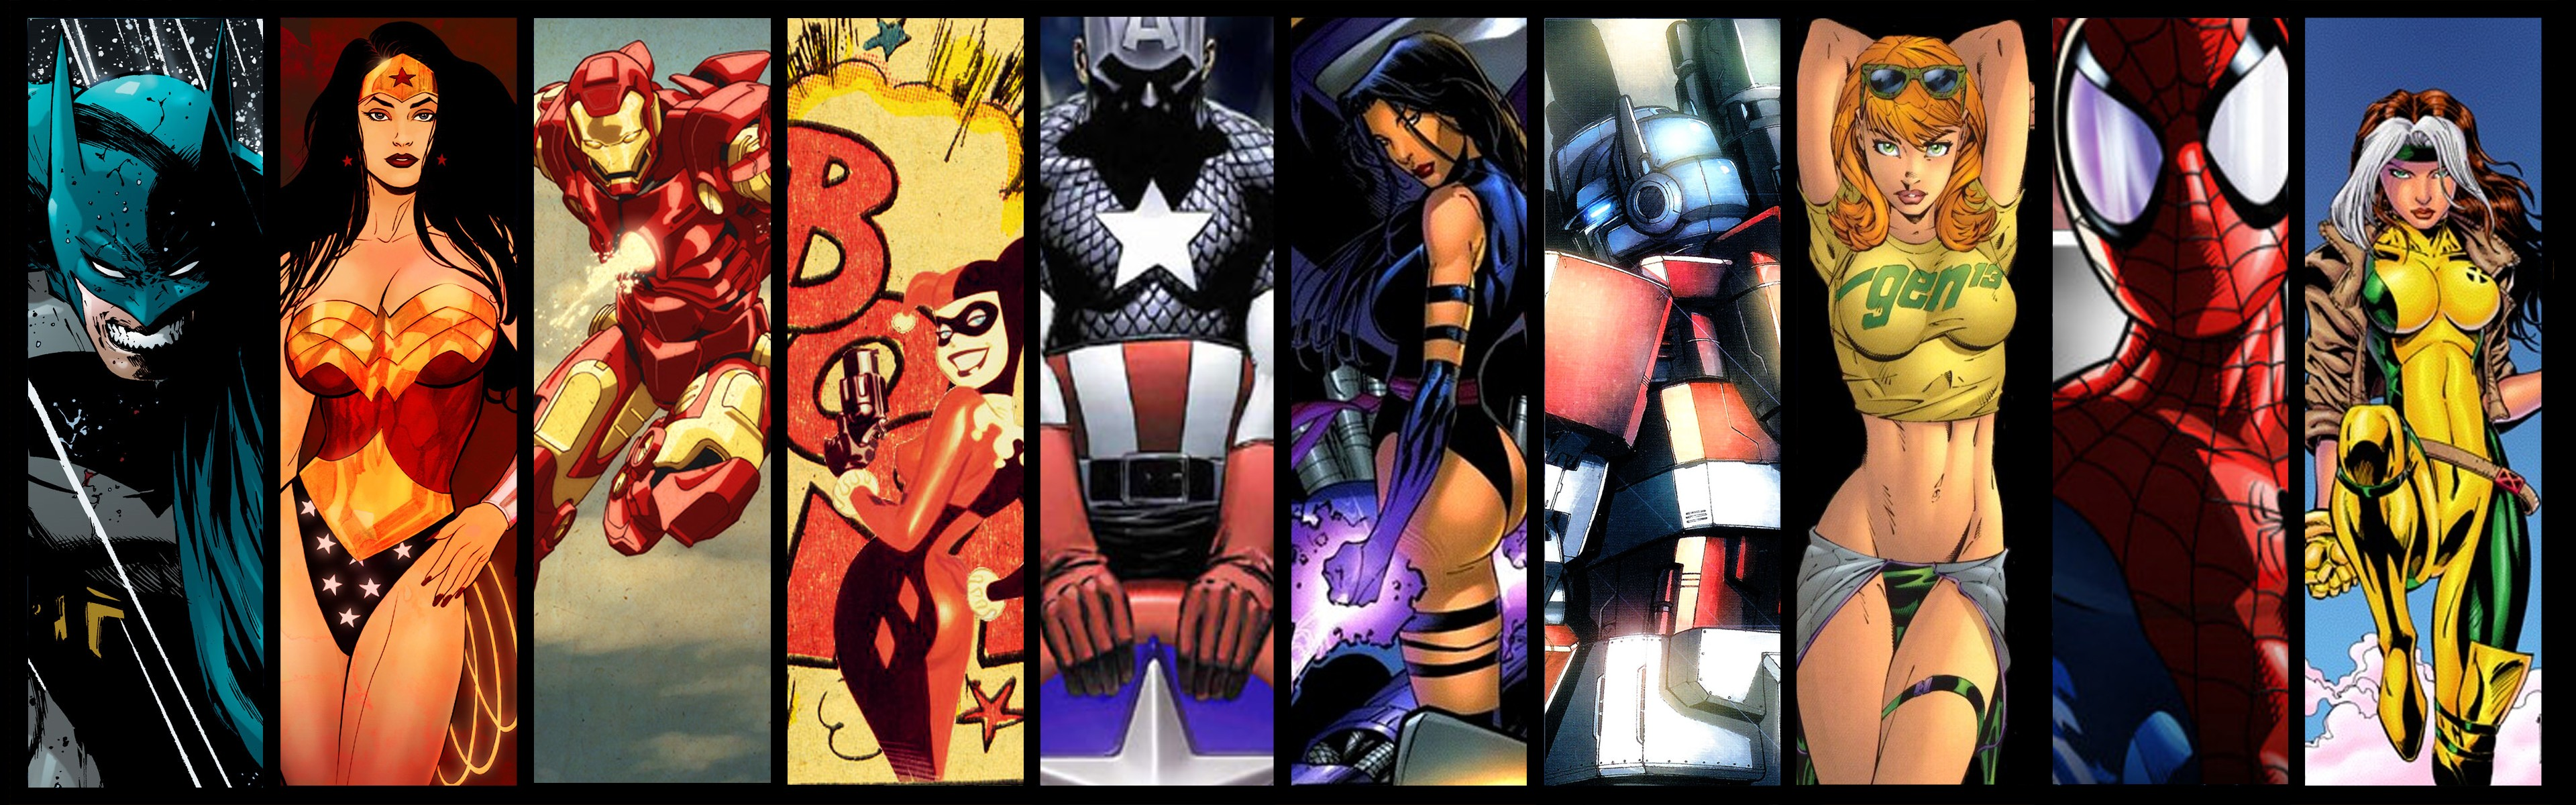 General 3840x1200 DC Comics Transformers Batman Harley Quinn Iron Man Wonder Woman Captain America Spider-Man collage